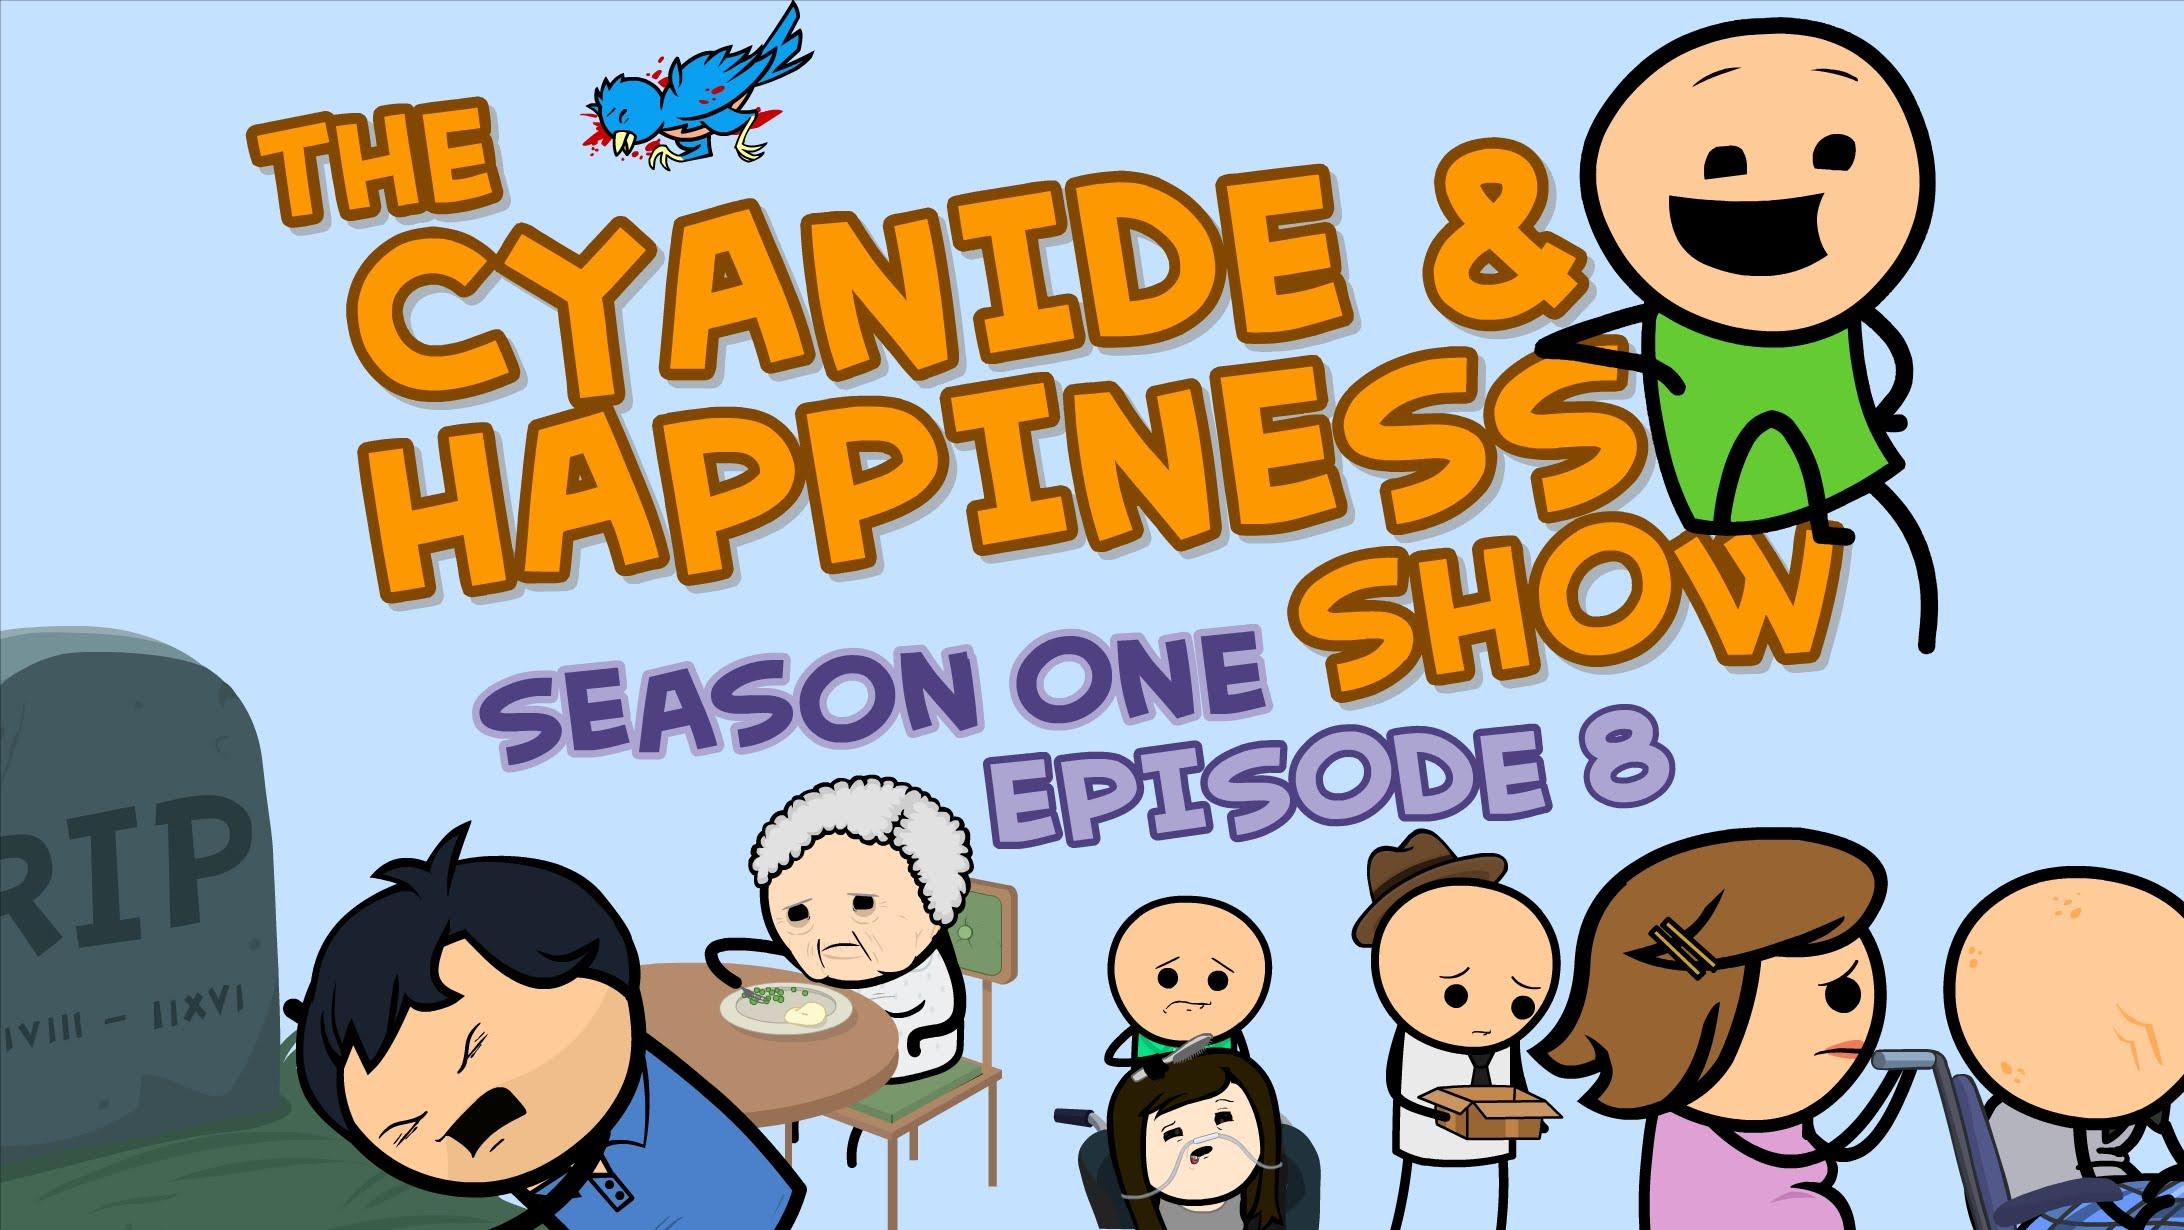 The Cyanide & Happiness Show Season 3 1